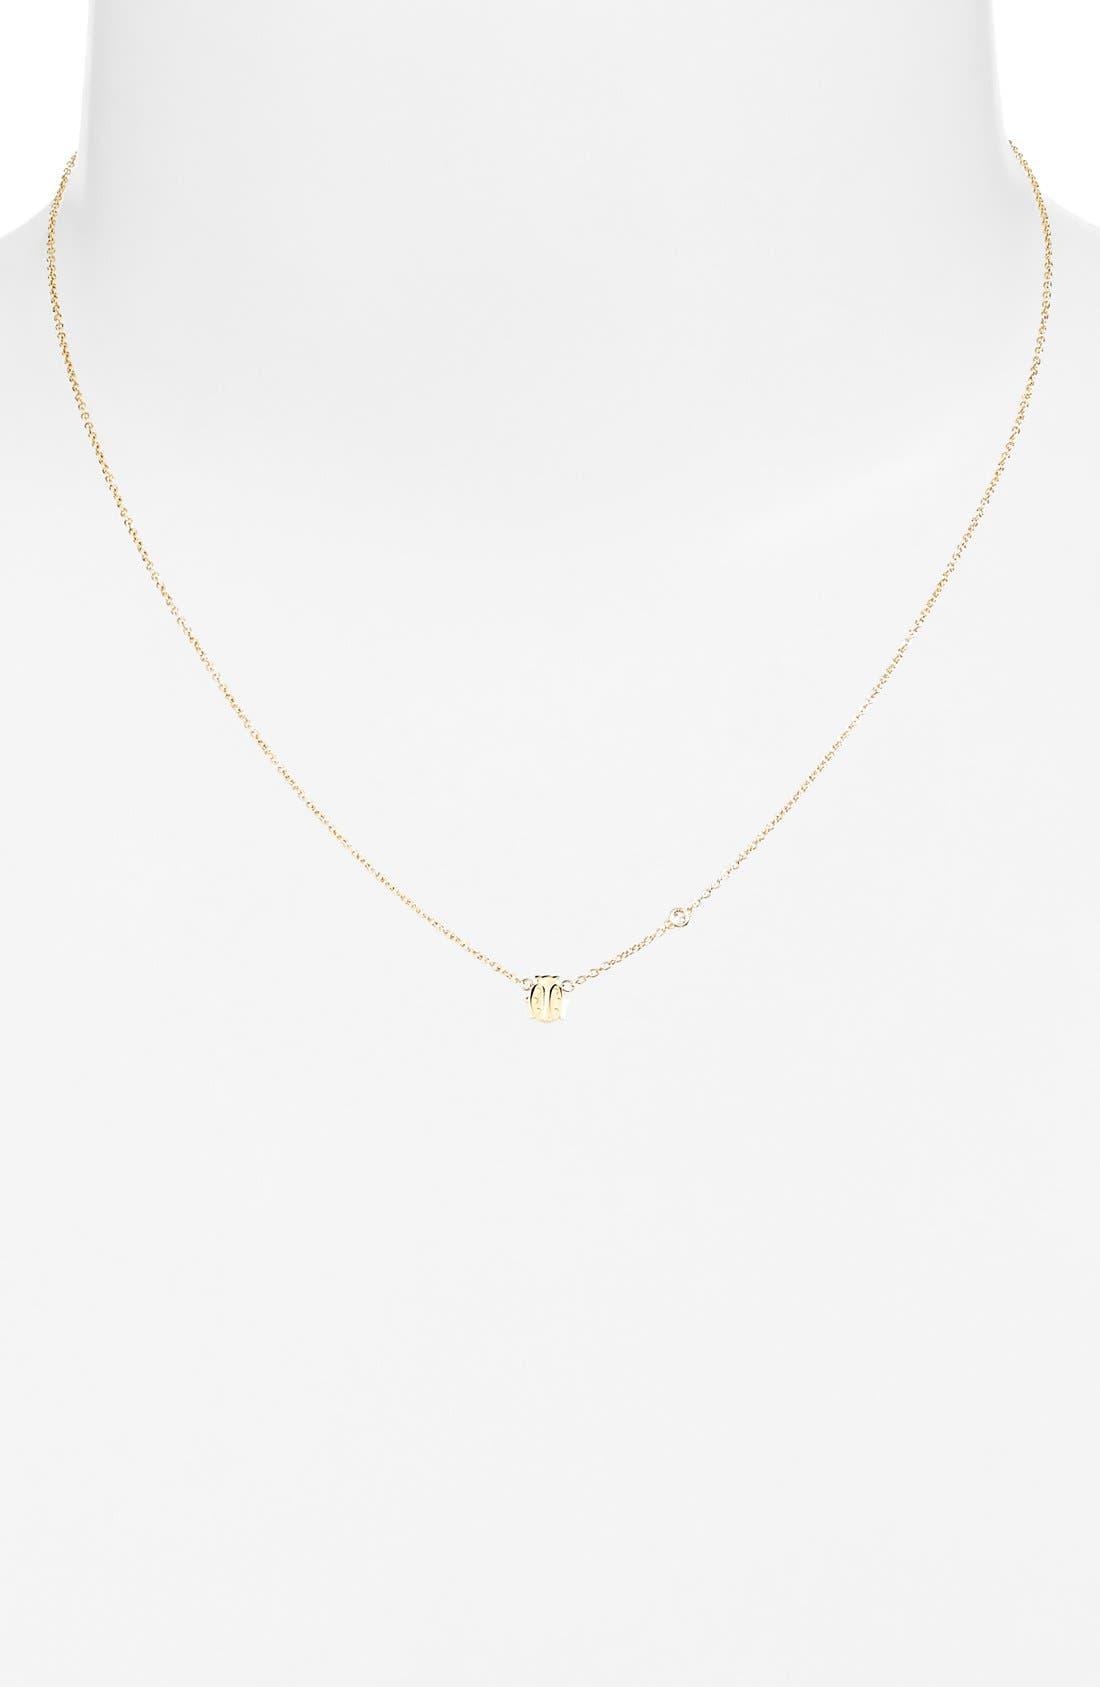 Ladybug Necklace,                             Alternate thumbnail 2, color,                             GOLD